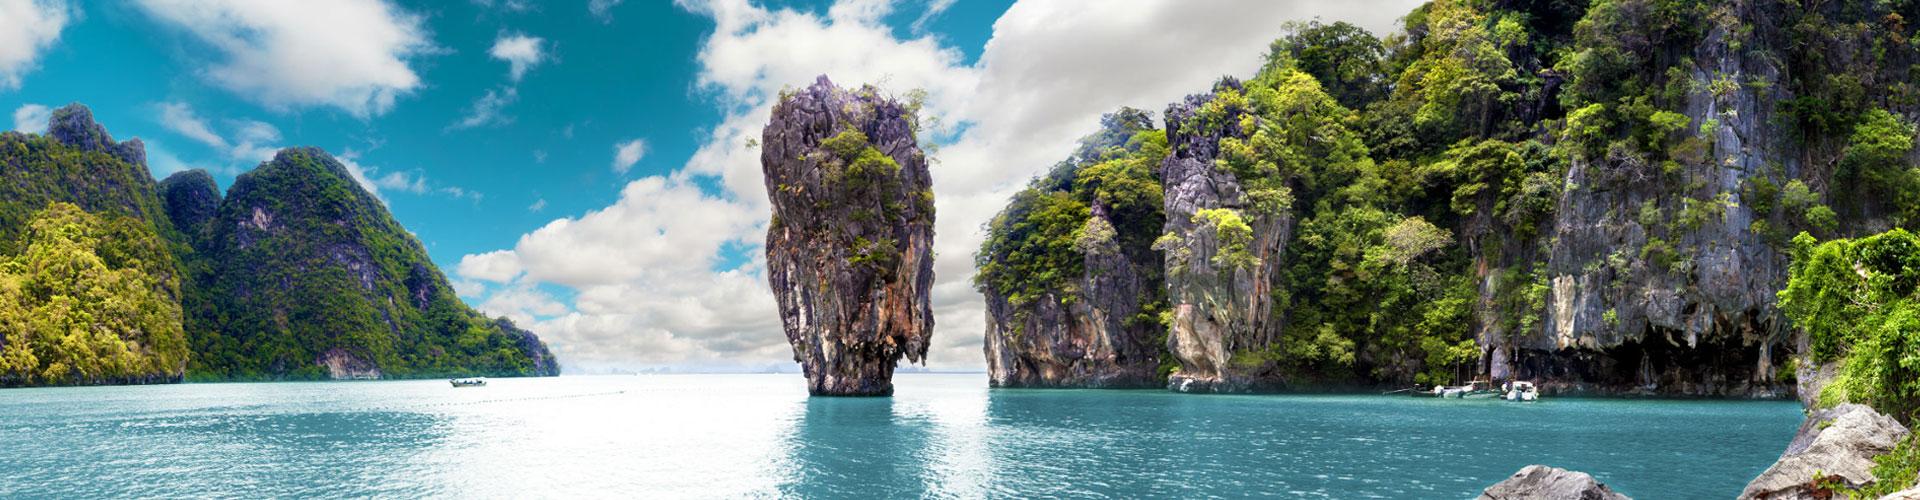 Phuket, Phi Phi Island, Pha Nga Island, Krabi